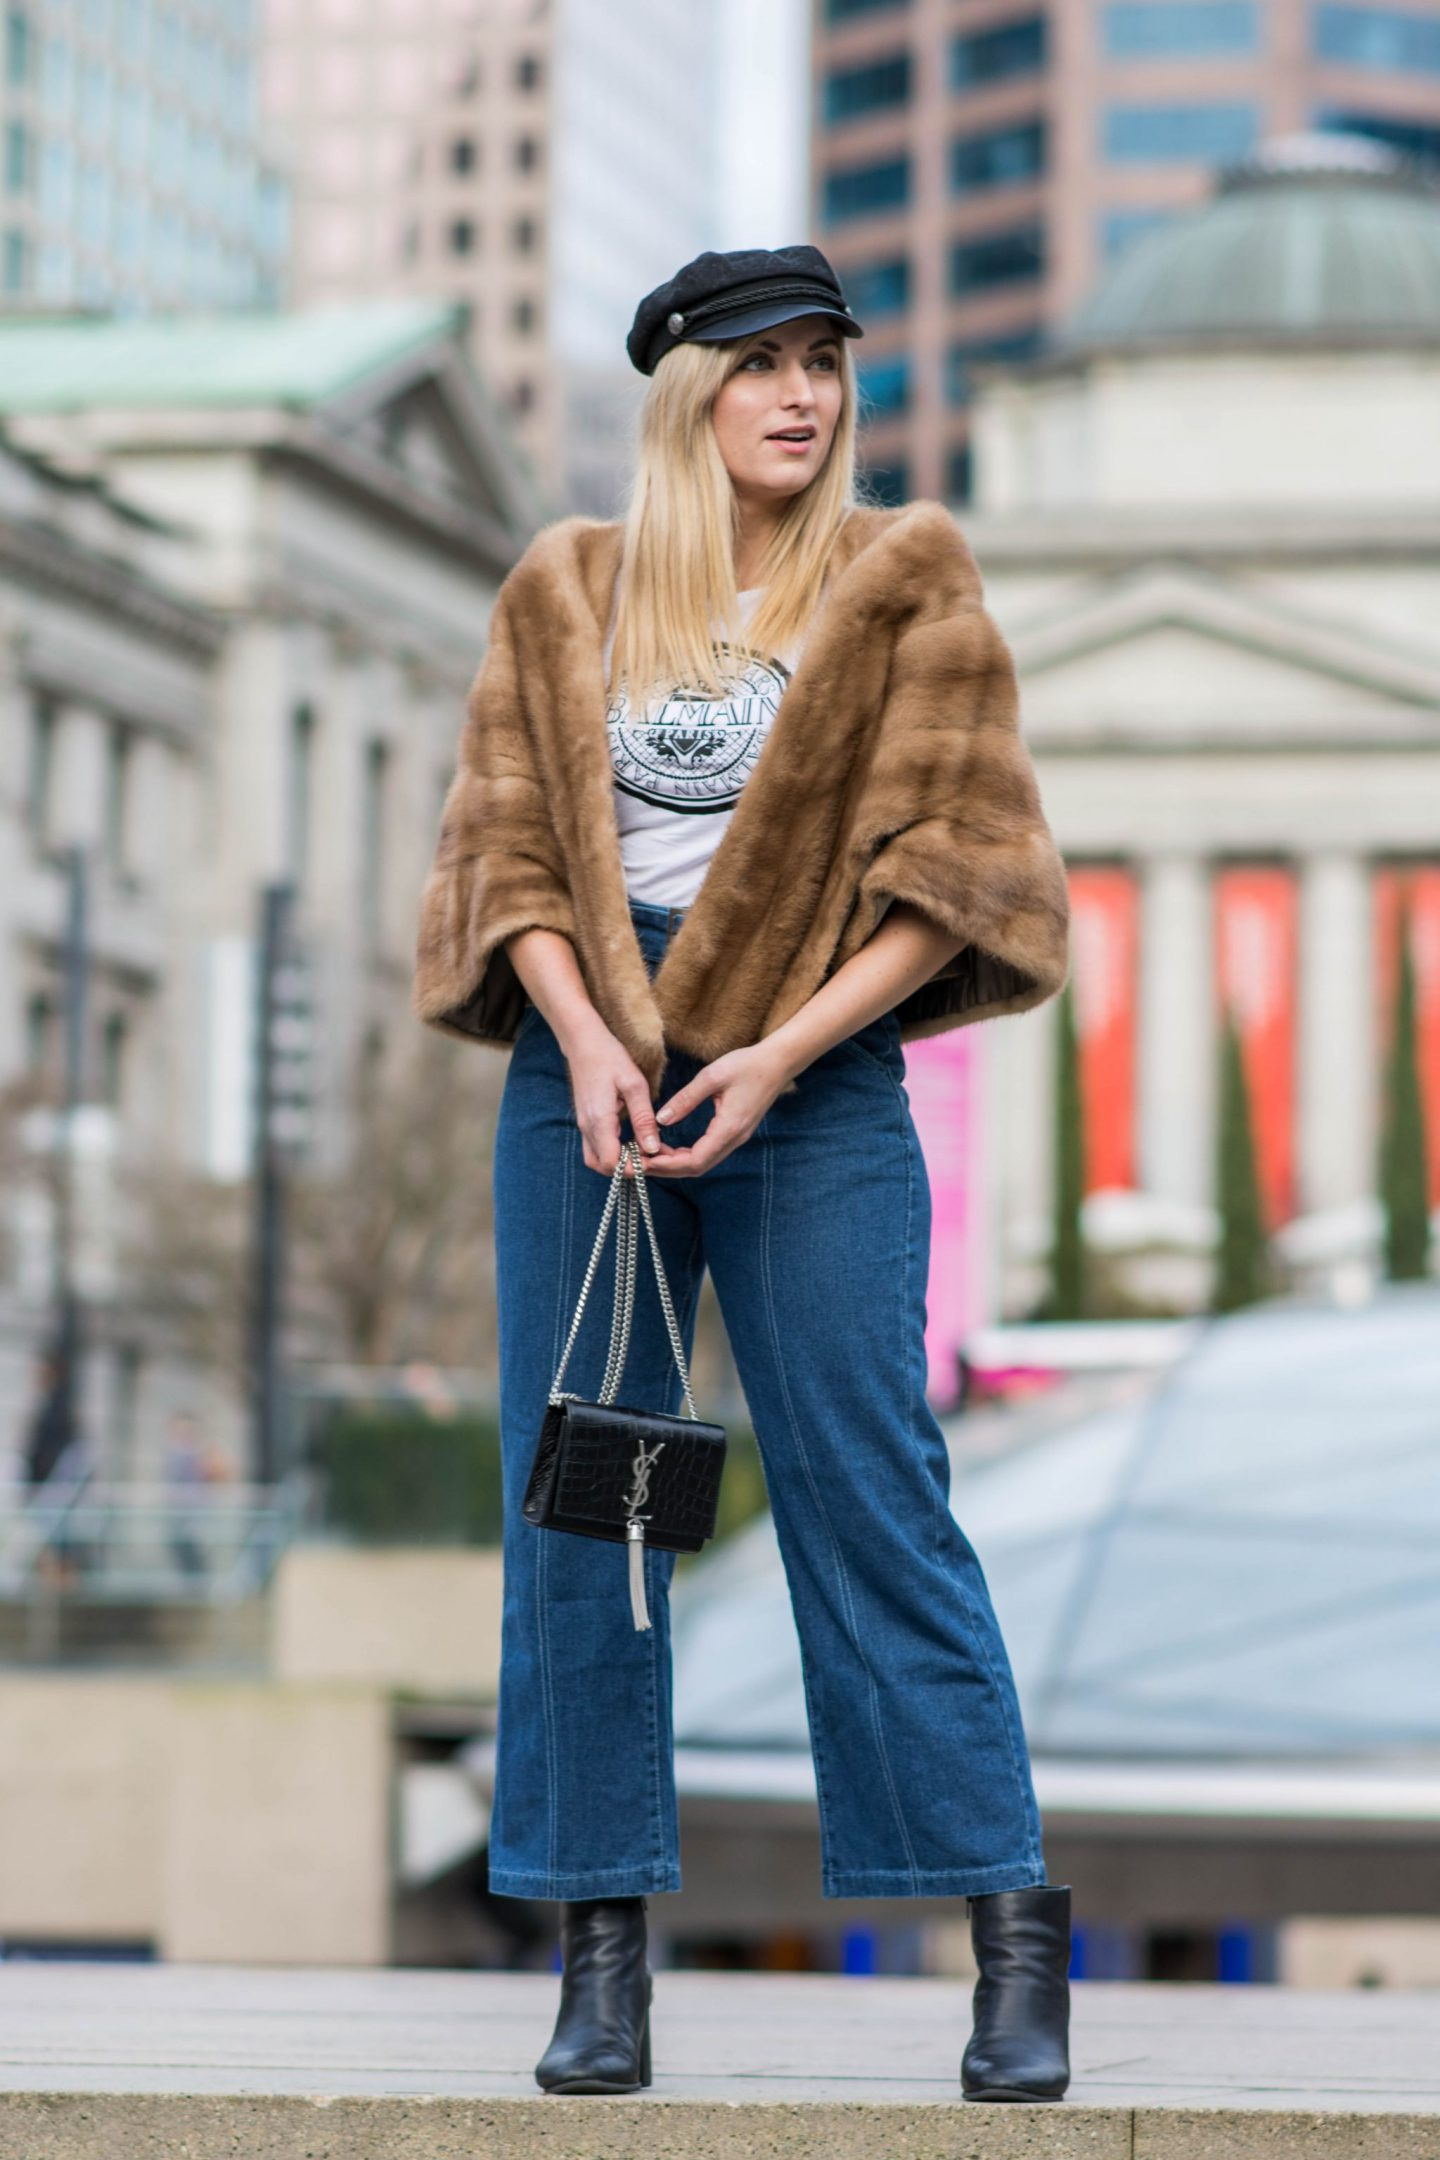 legallee-blonde-wearing-denim-culottes-fur-stole-YSL-handbag